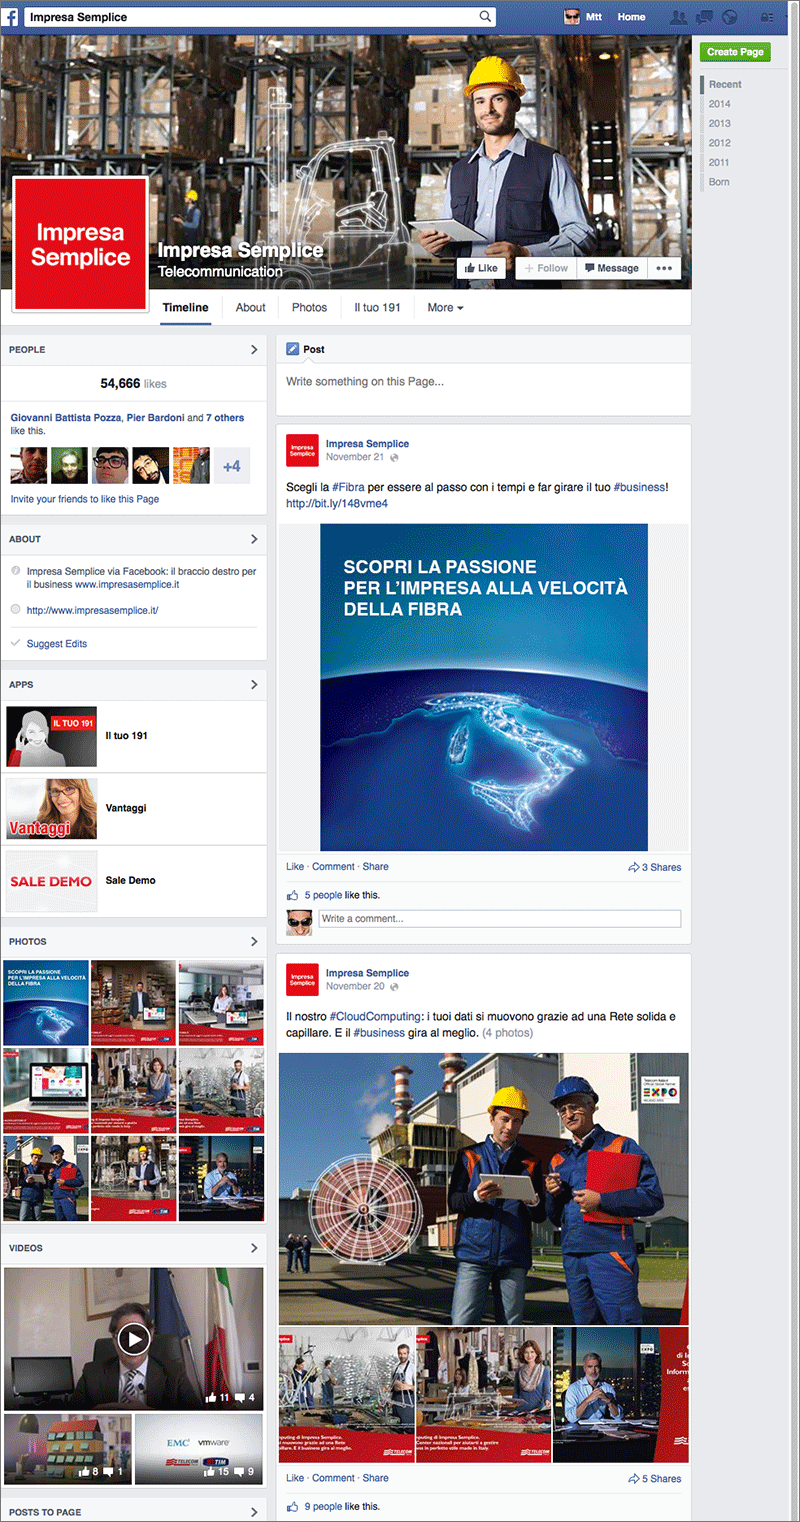 Pagina Facebook di Impresa Semplice